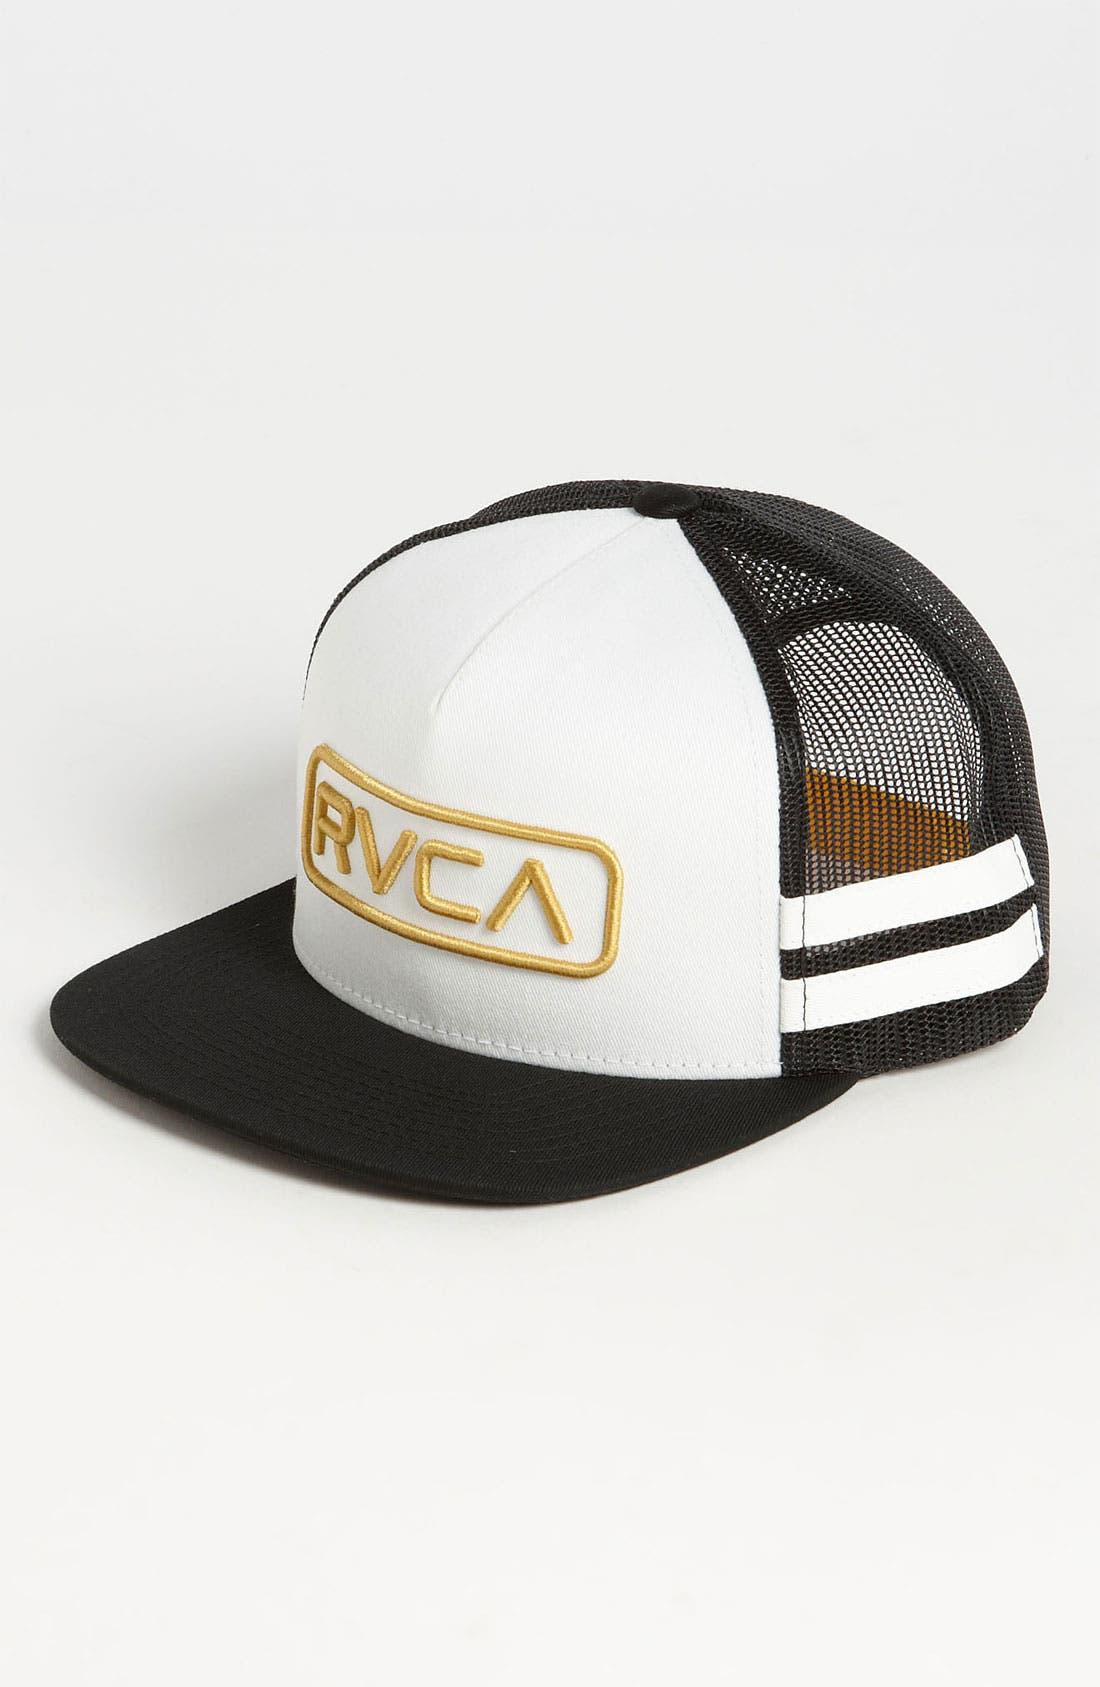 Main Image - RVCA 'Movement' Trucker Hat